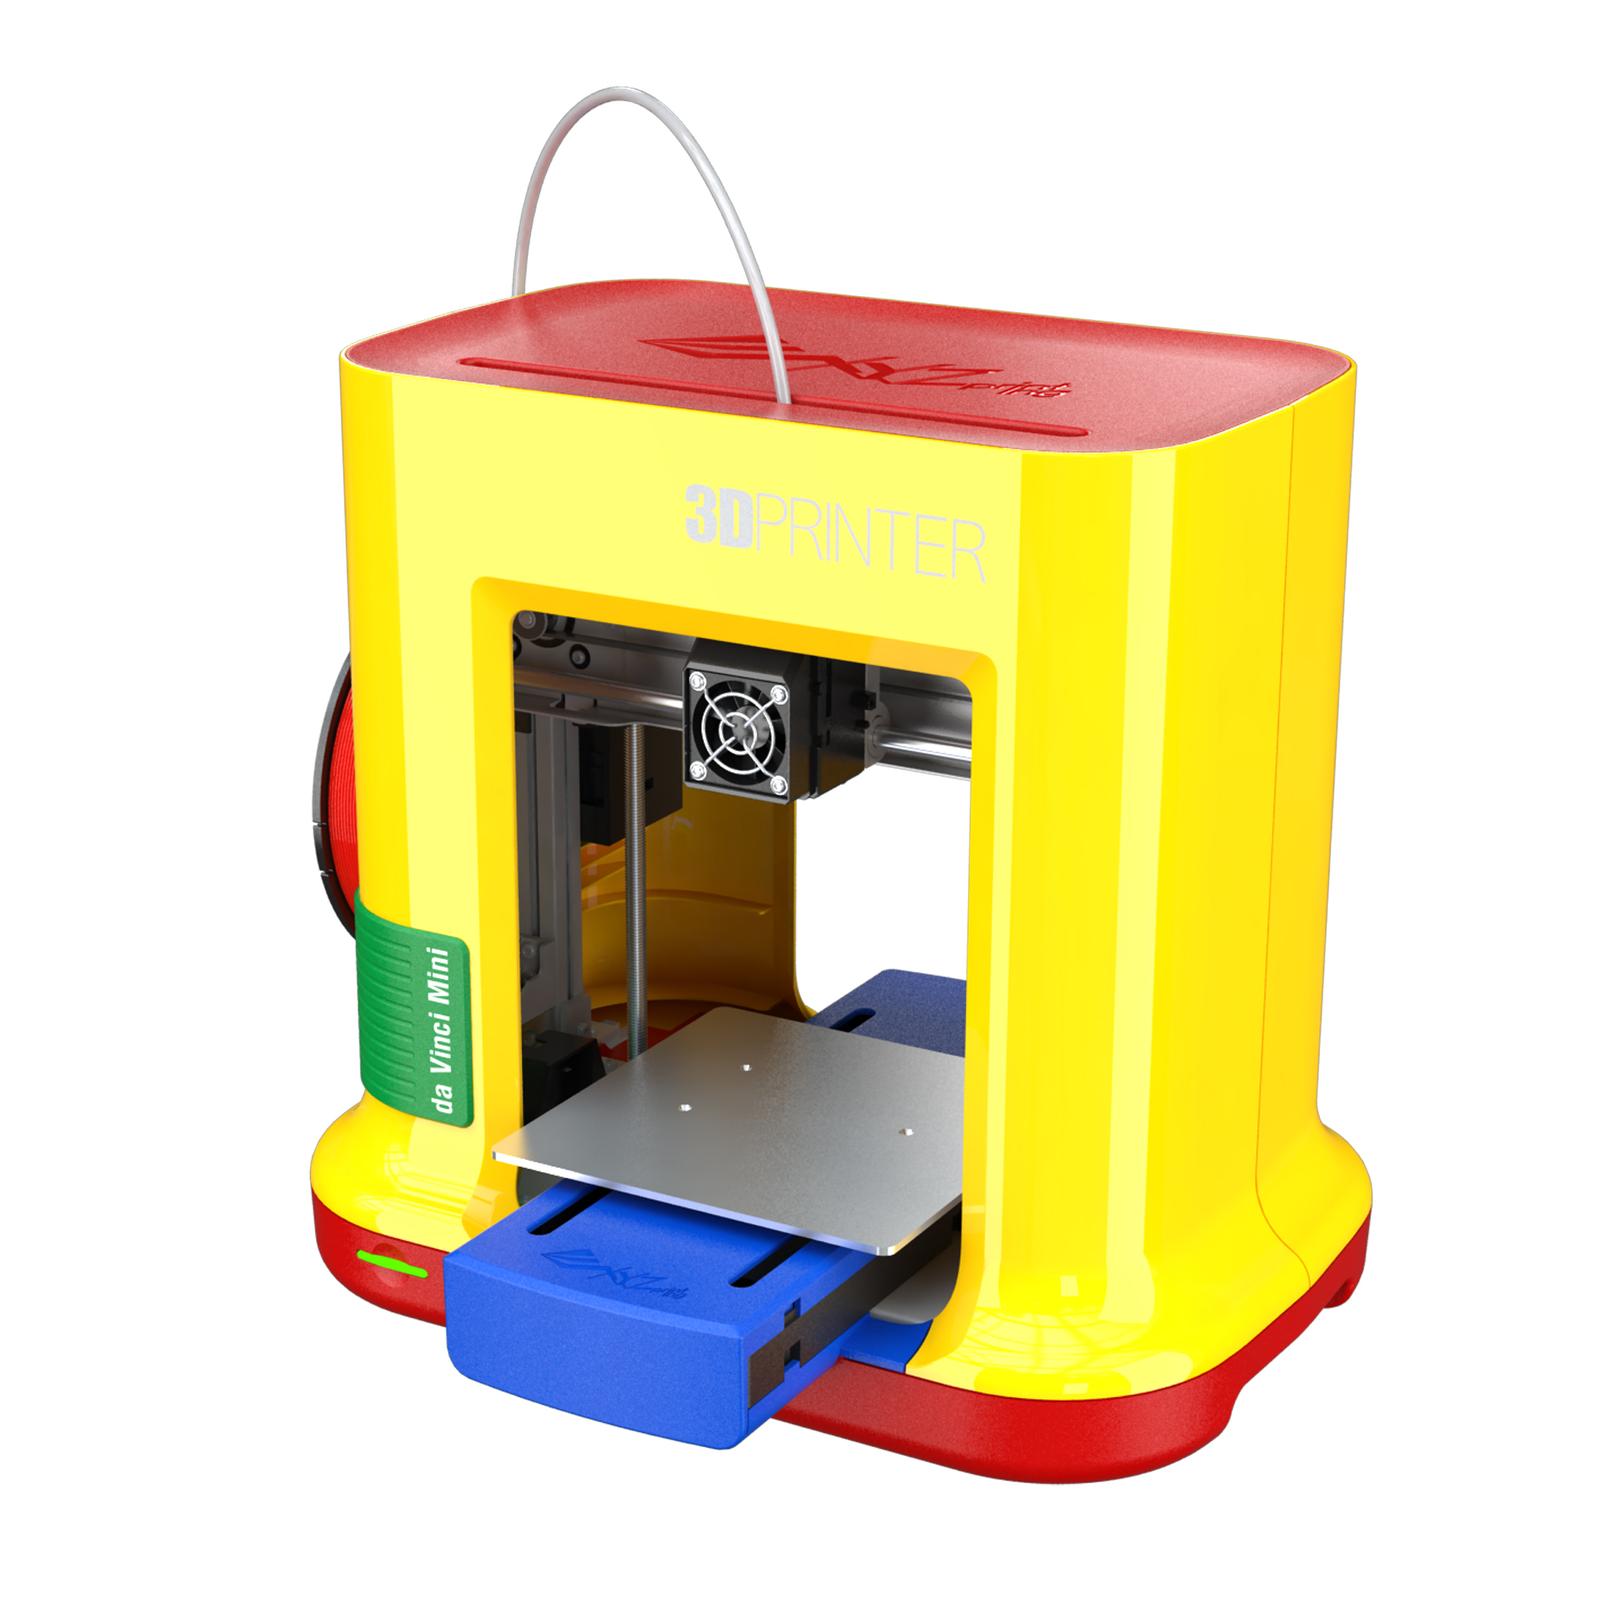 Xyz Da Vinci Mini Maker 3D Printer image